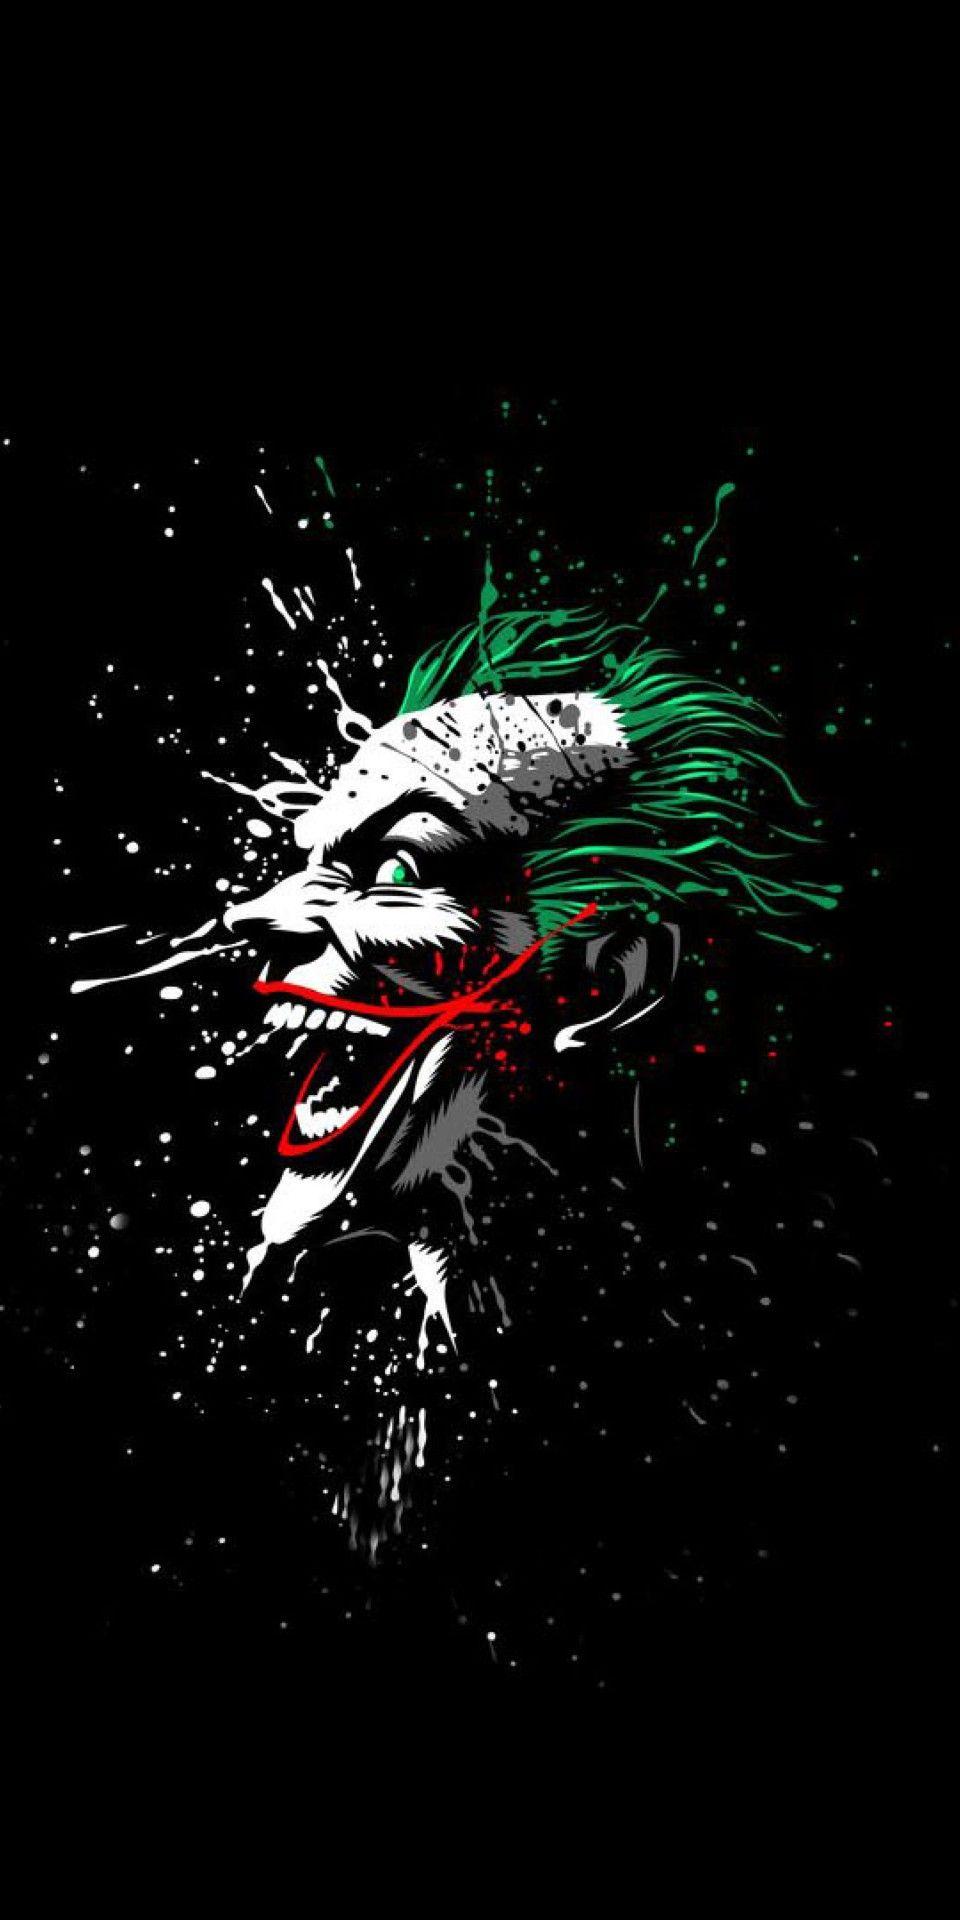 Pin By Krishnam School On Super Heroes Pictures Joker Artwork Joker Hd Wallpaper Joker Wallpapers